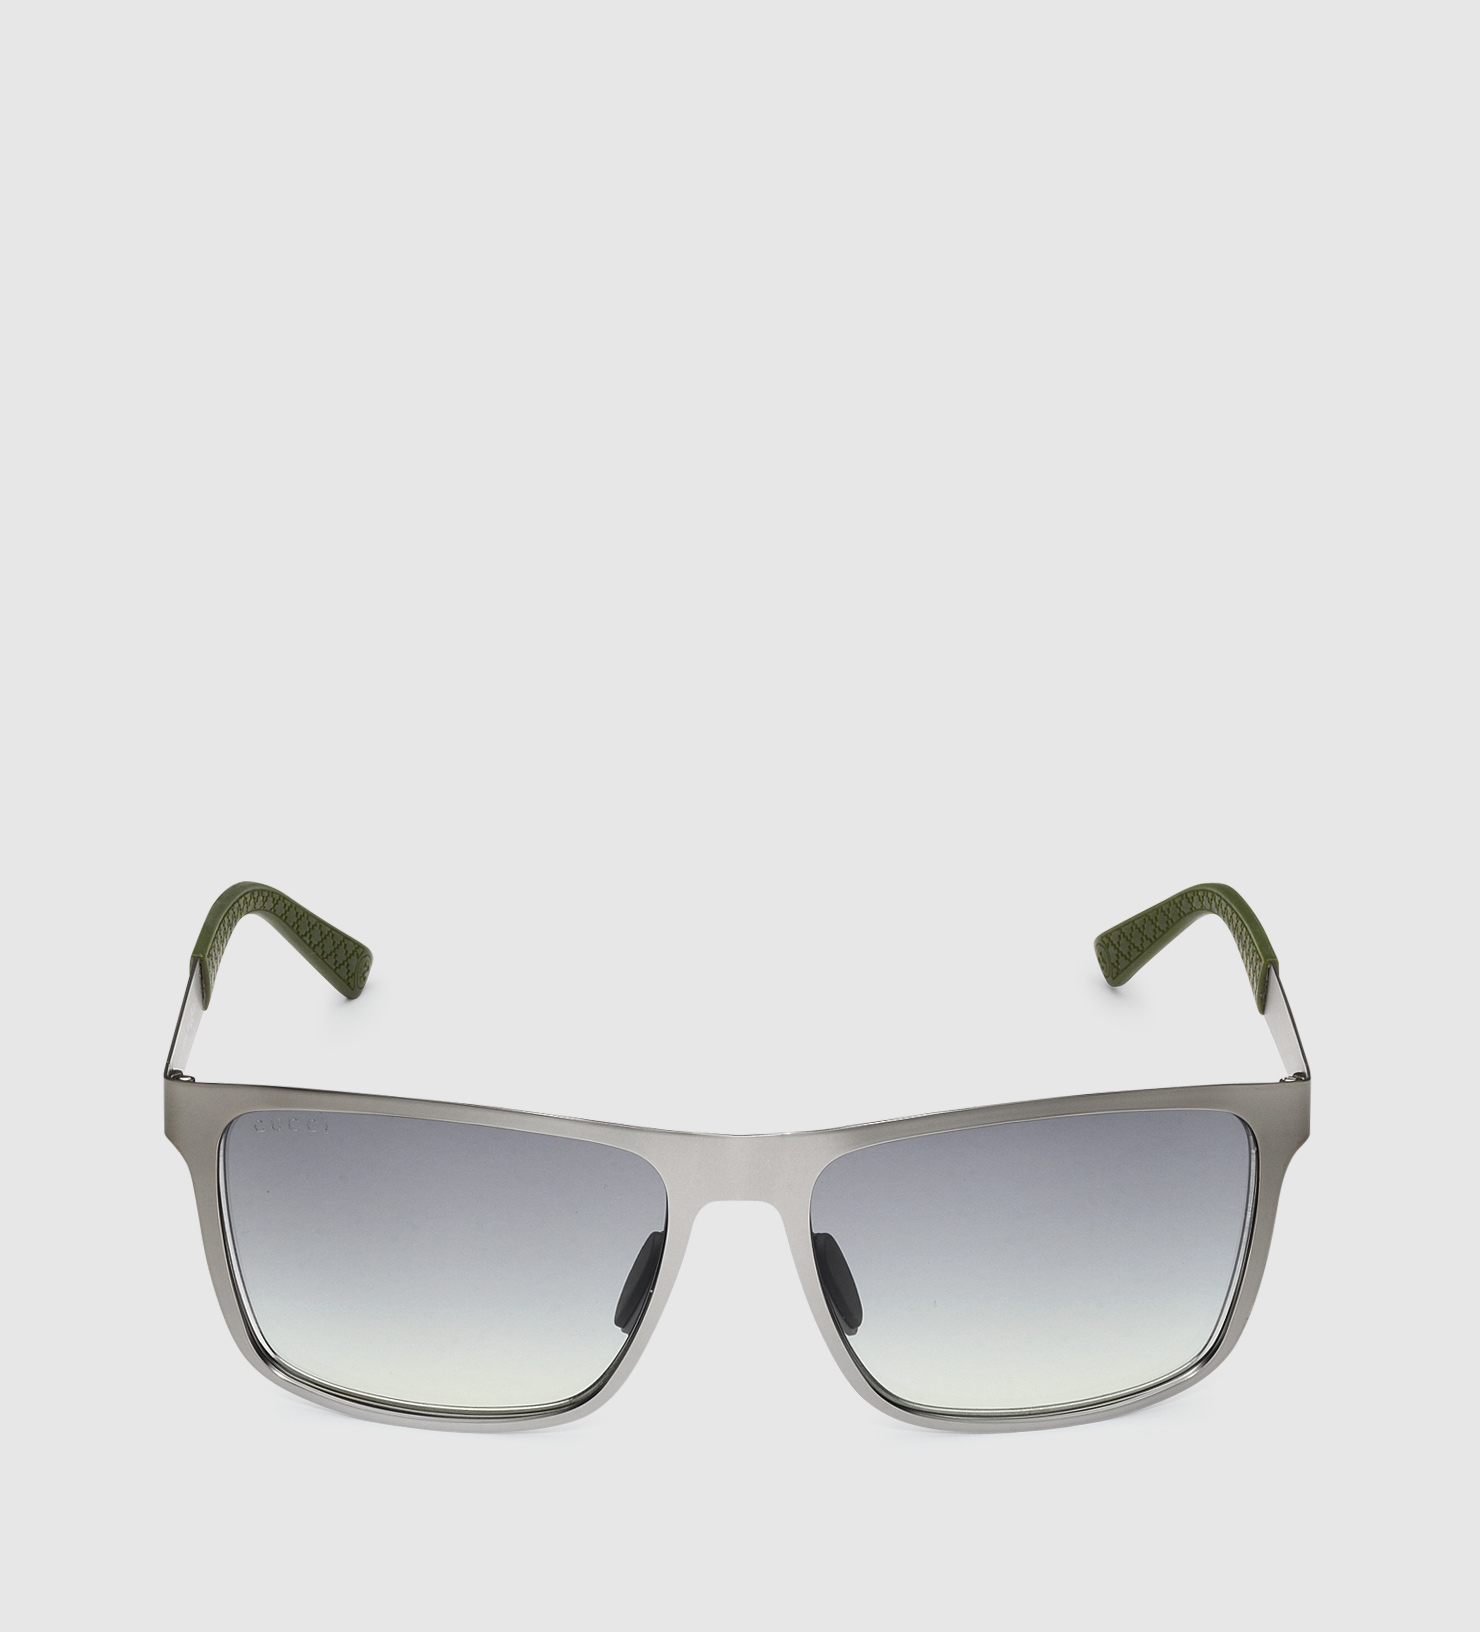 Active Sunglasses  gucci sport active sunglasses in gray for men lyst